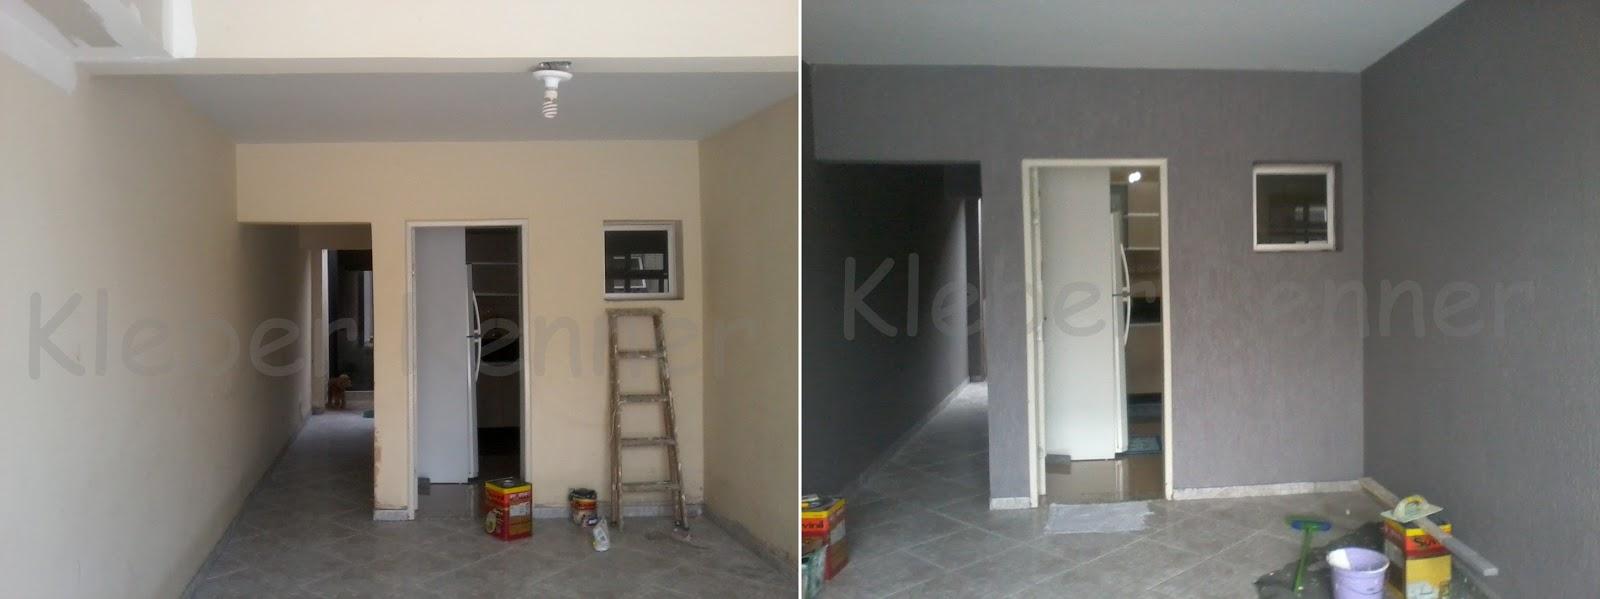 Kleber Renner Pintura E Grafiato -> Fotos De Paredes Com Grafiato